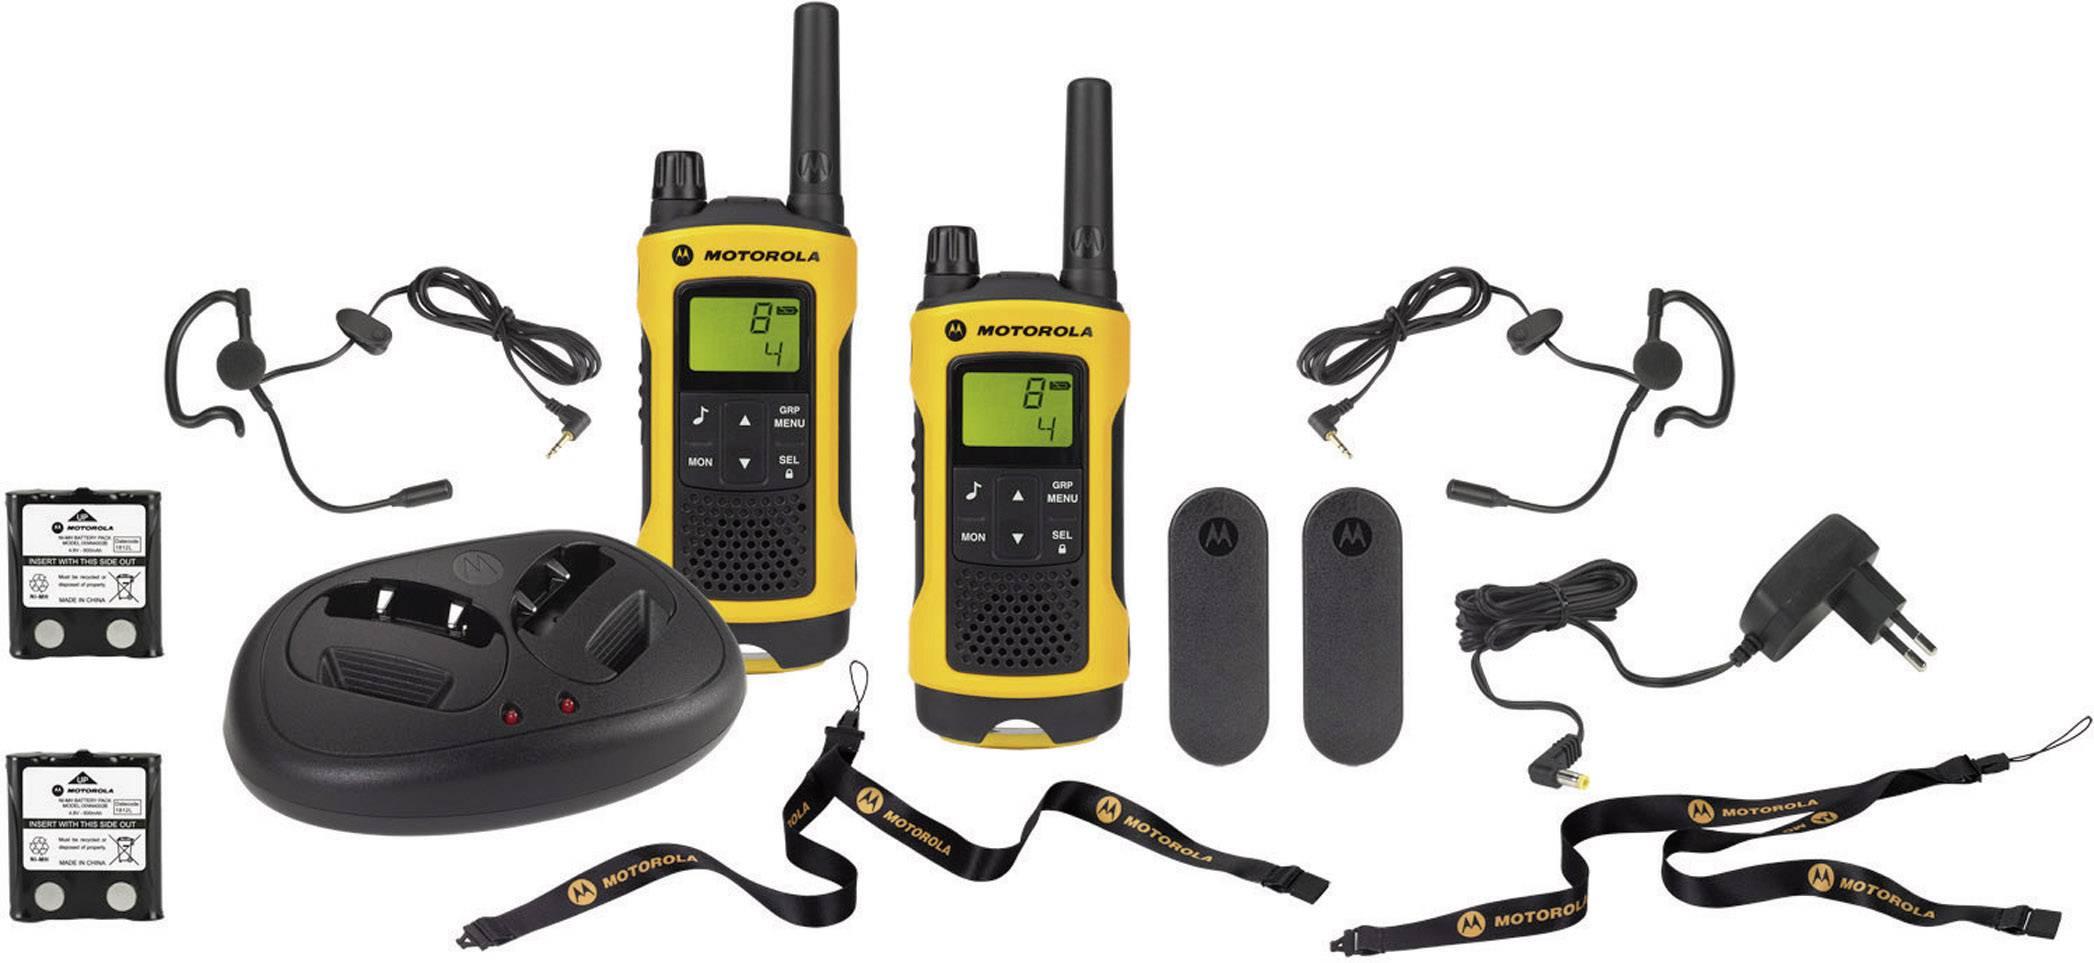 PMR vysielačky Motorola TLKR T80 Extreme, 2 ks